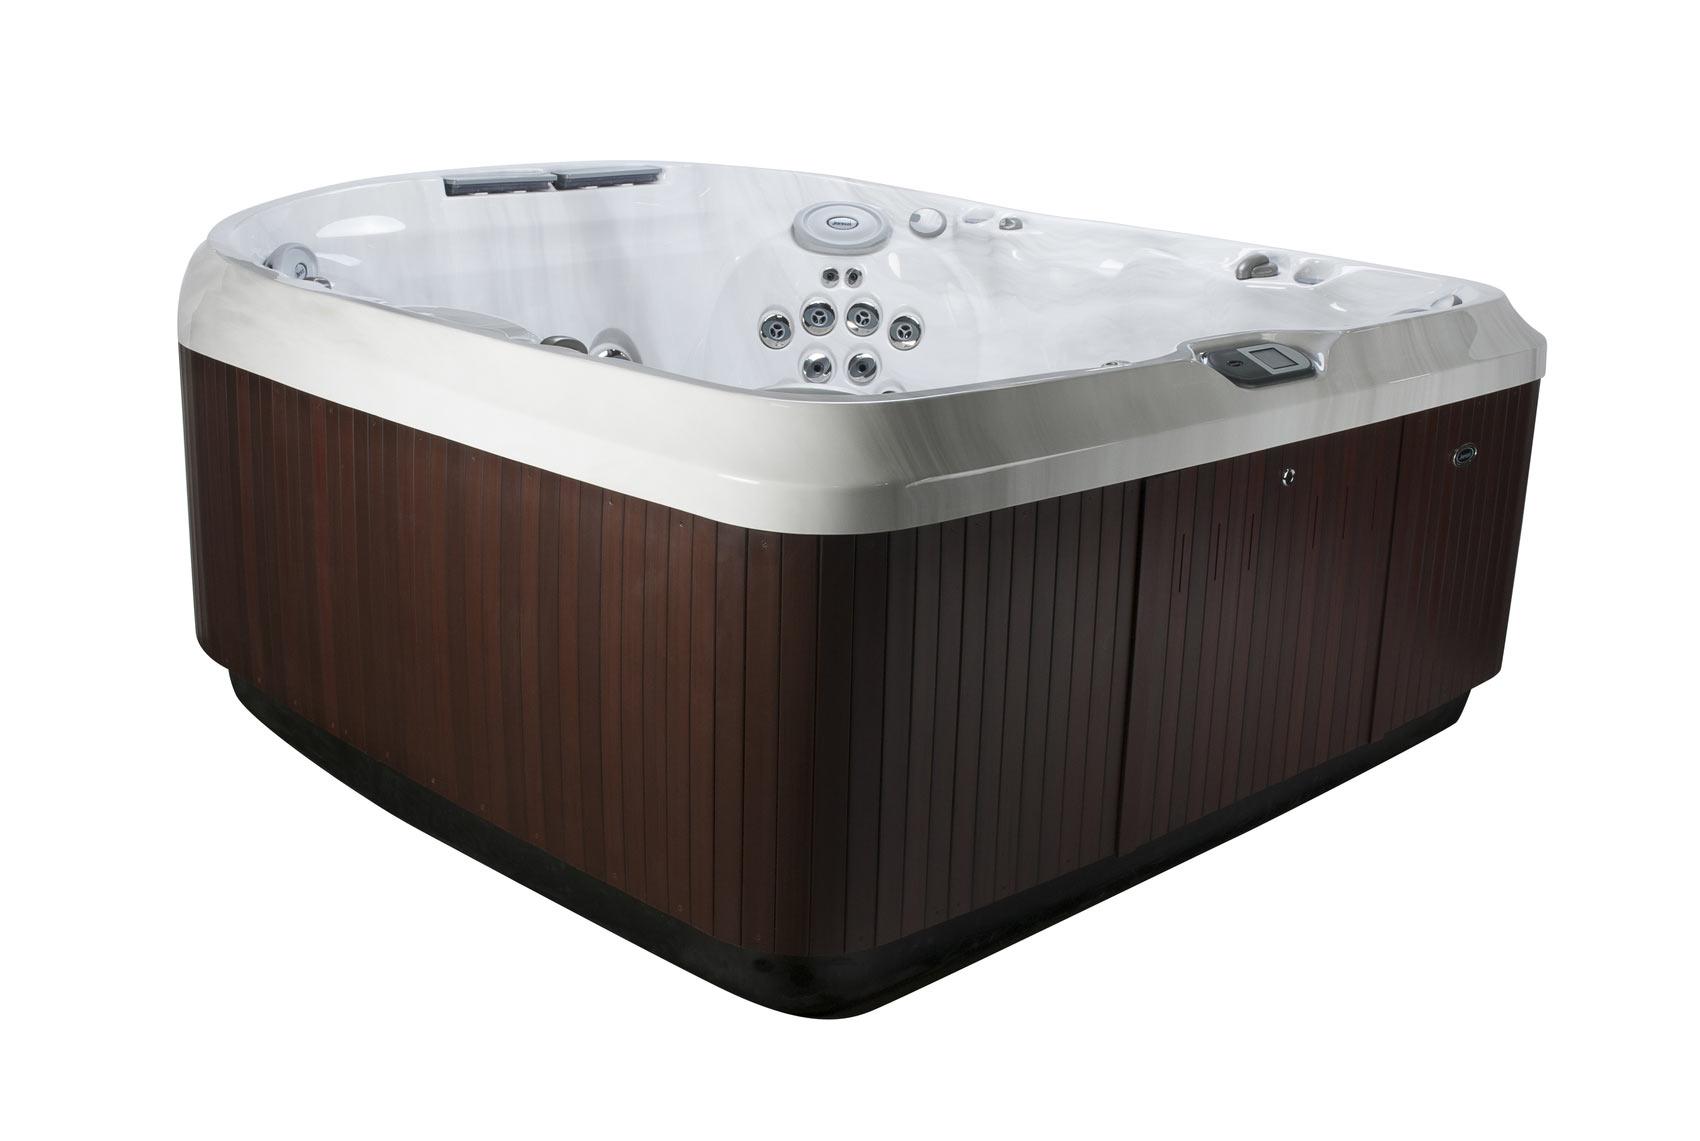 Jacuzzi 365 Hot Tub Wiring Diagram. Jacuzzi Parts, Jacuzzi Hot Tub on